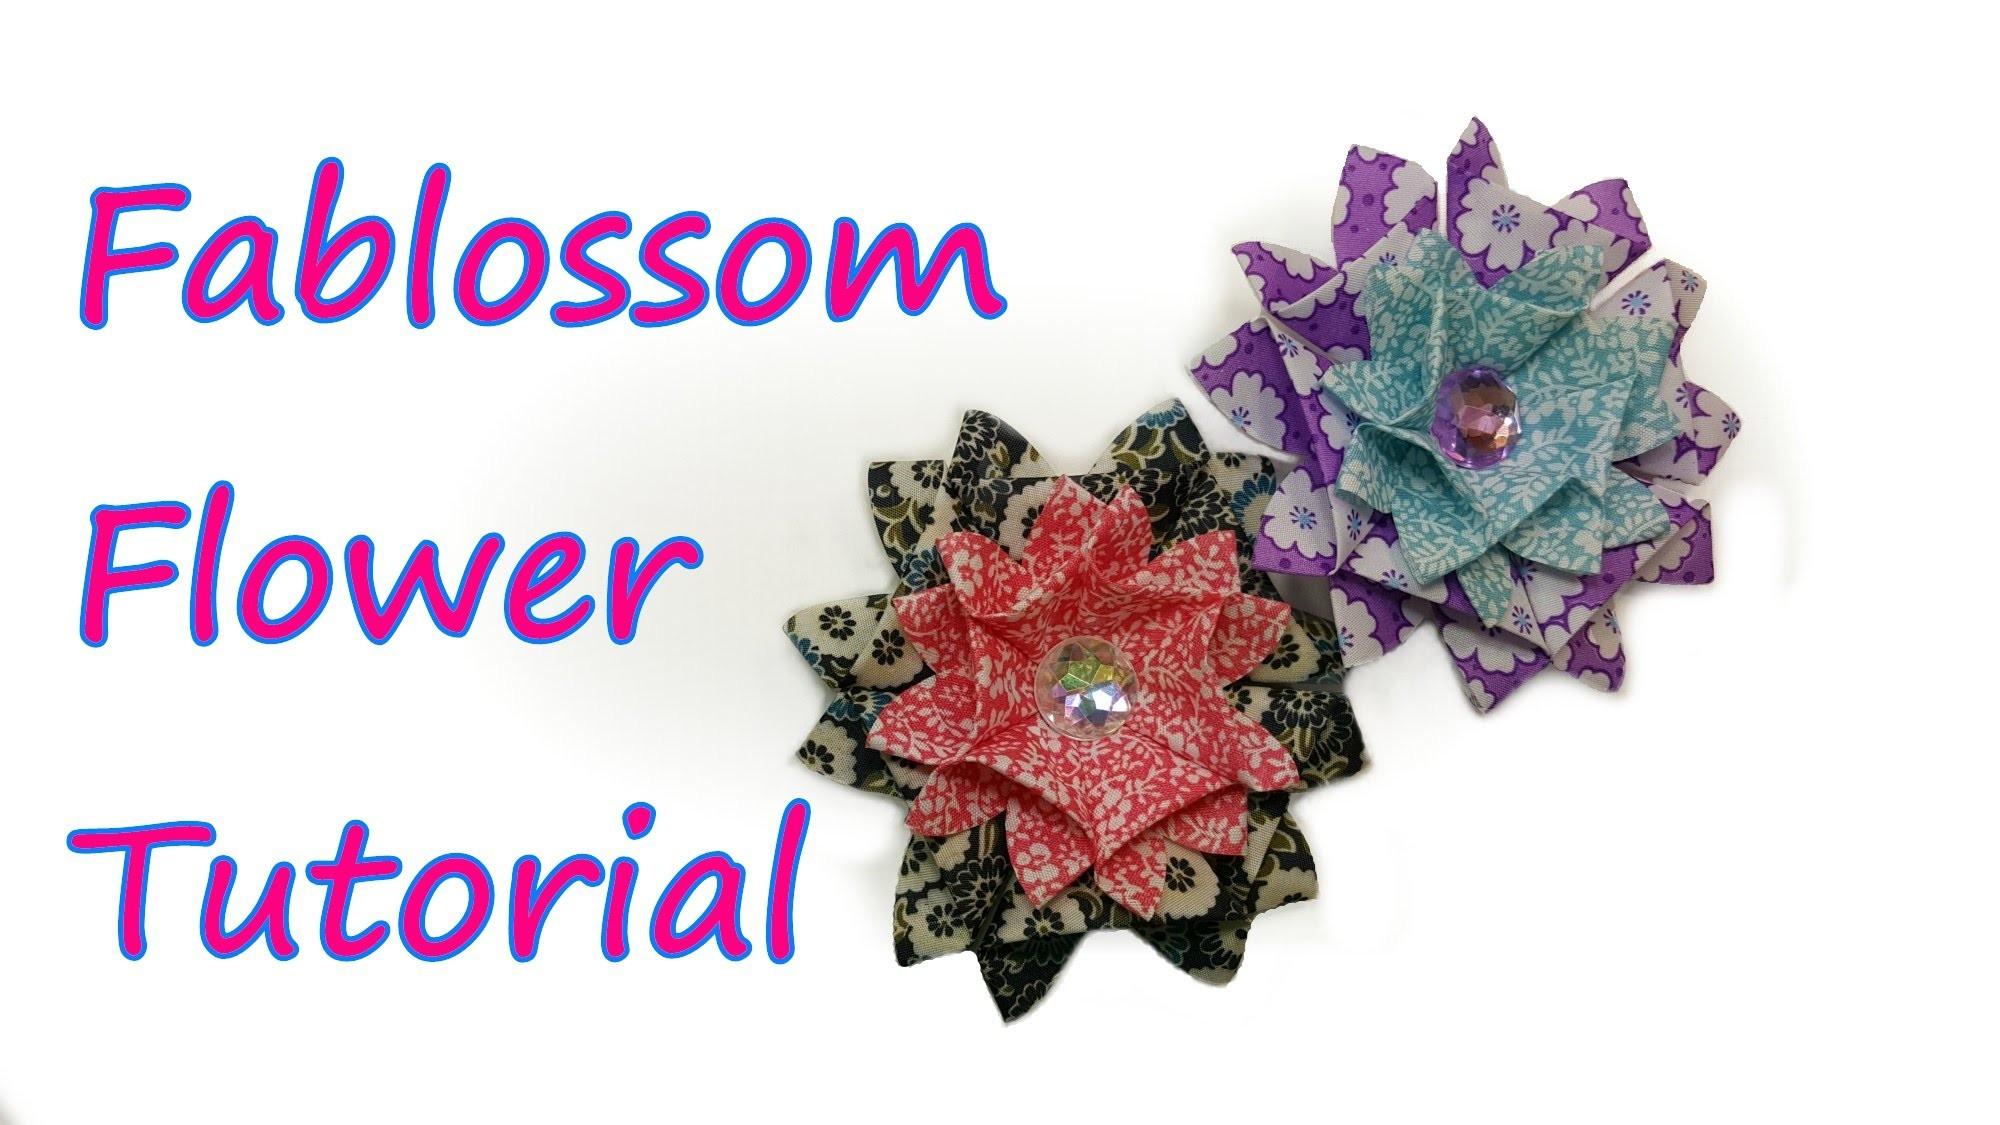 Fablossom Flower Tutorial by feelinspiffy